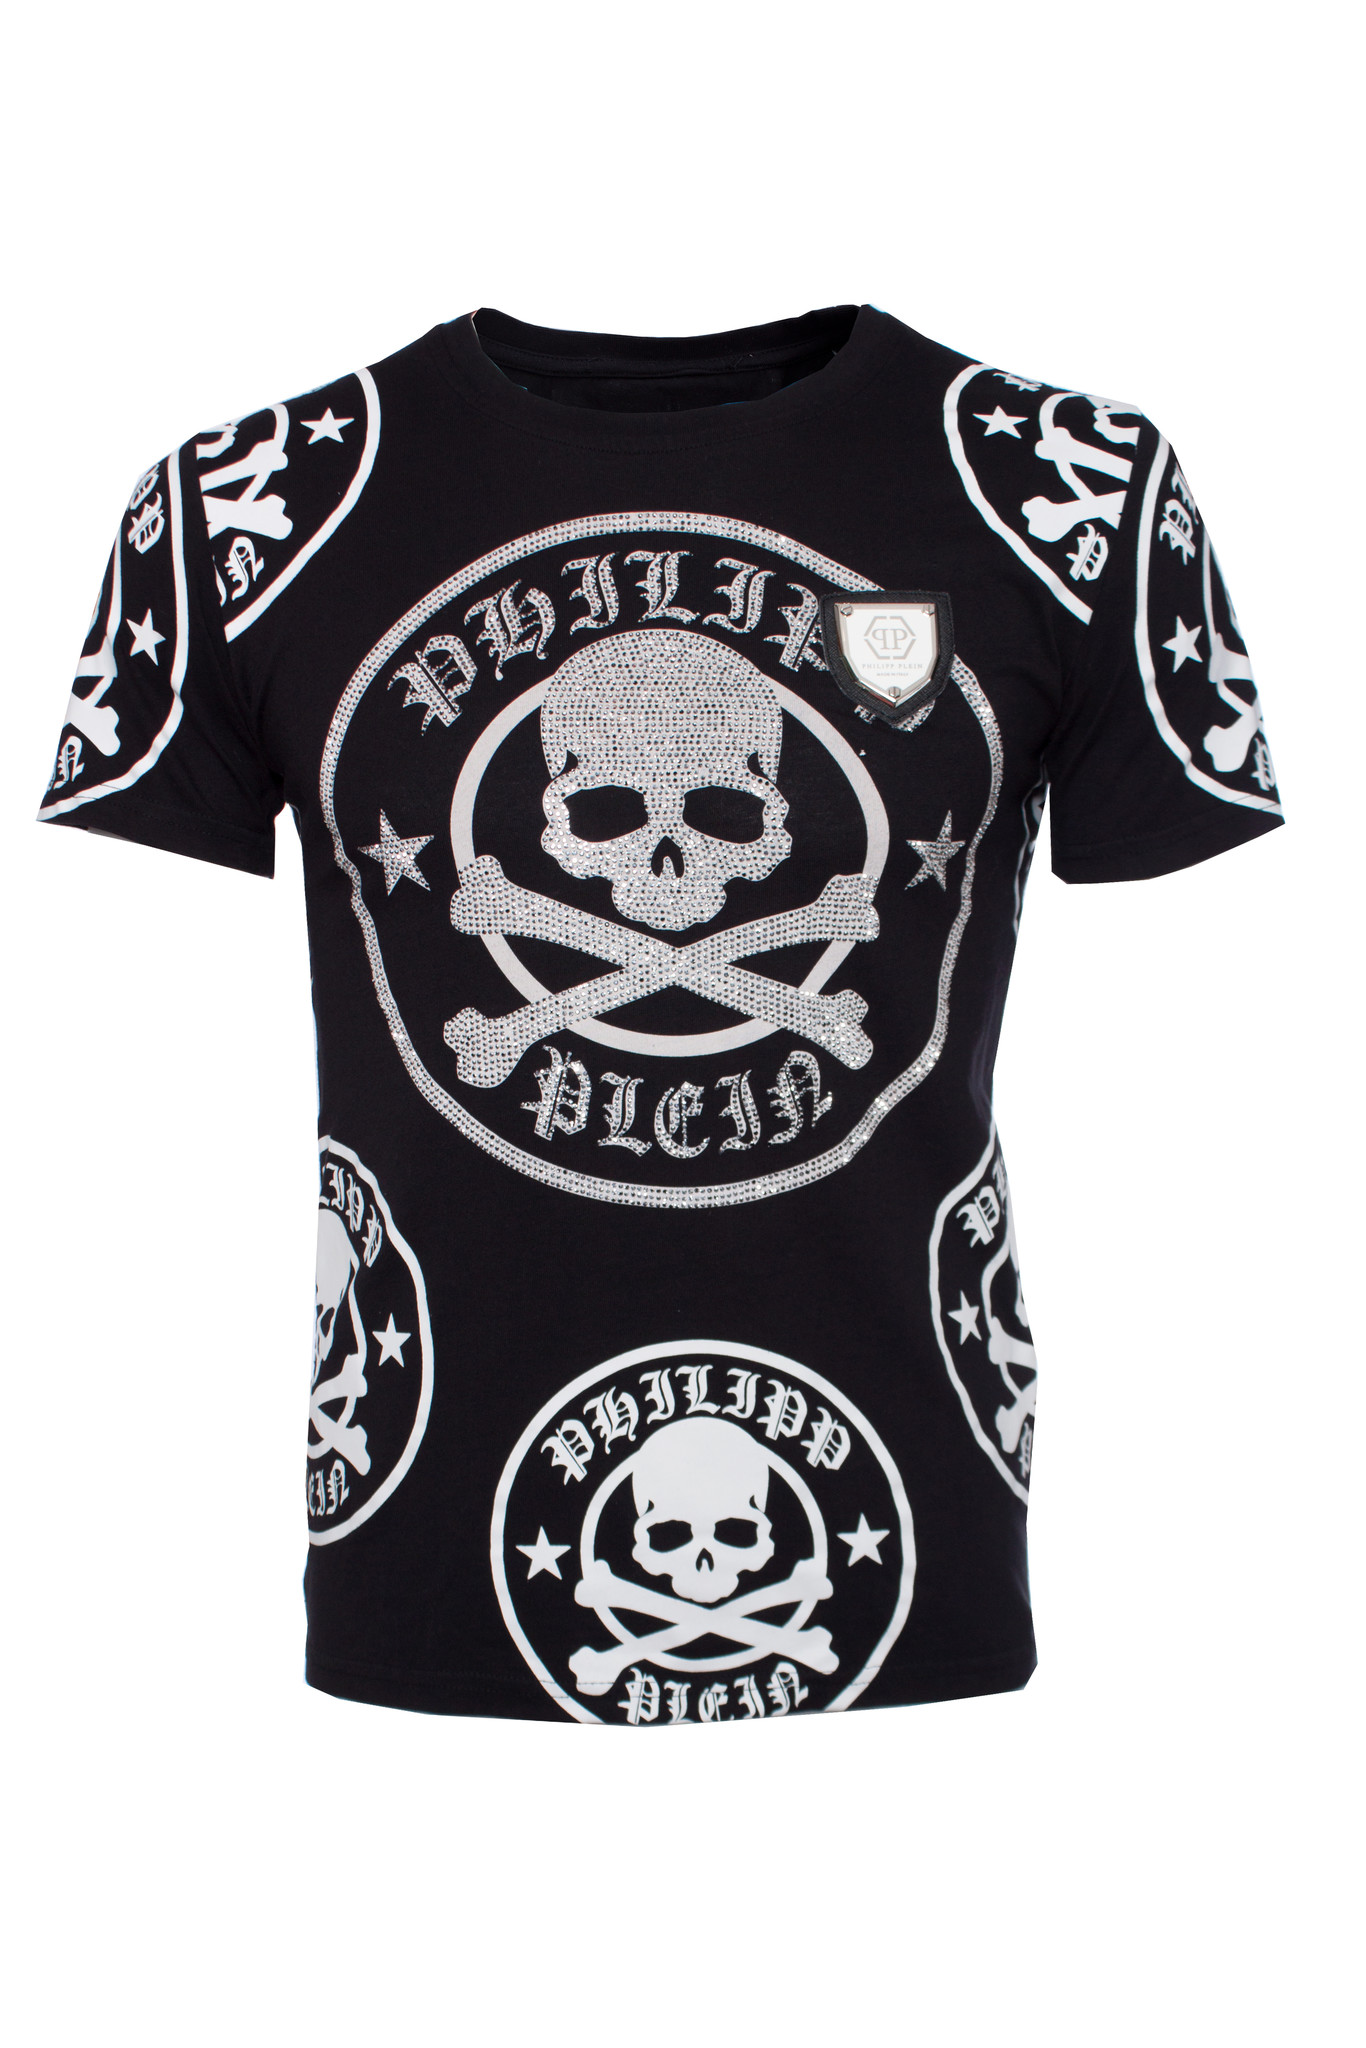 94096192e2 Philipp Plein, Black T-shirt with skull print in stones in size M. - Unique  Designer Pieces